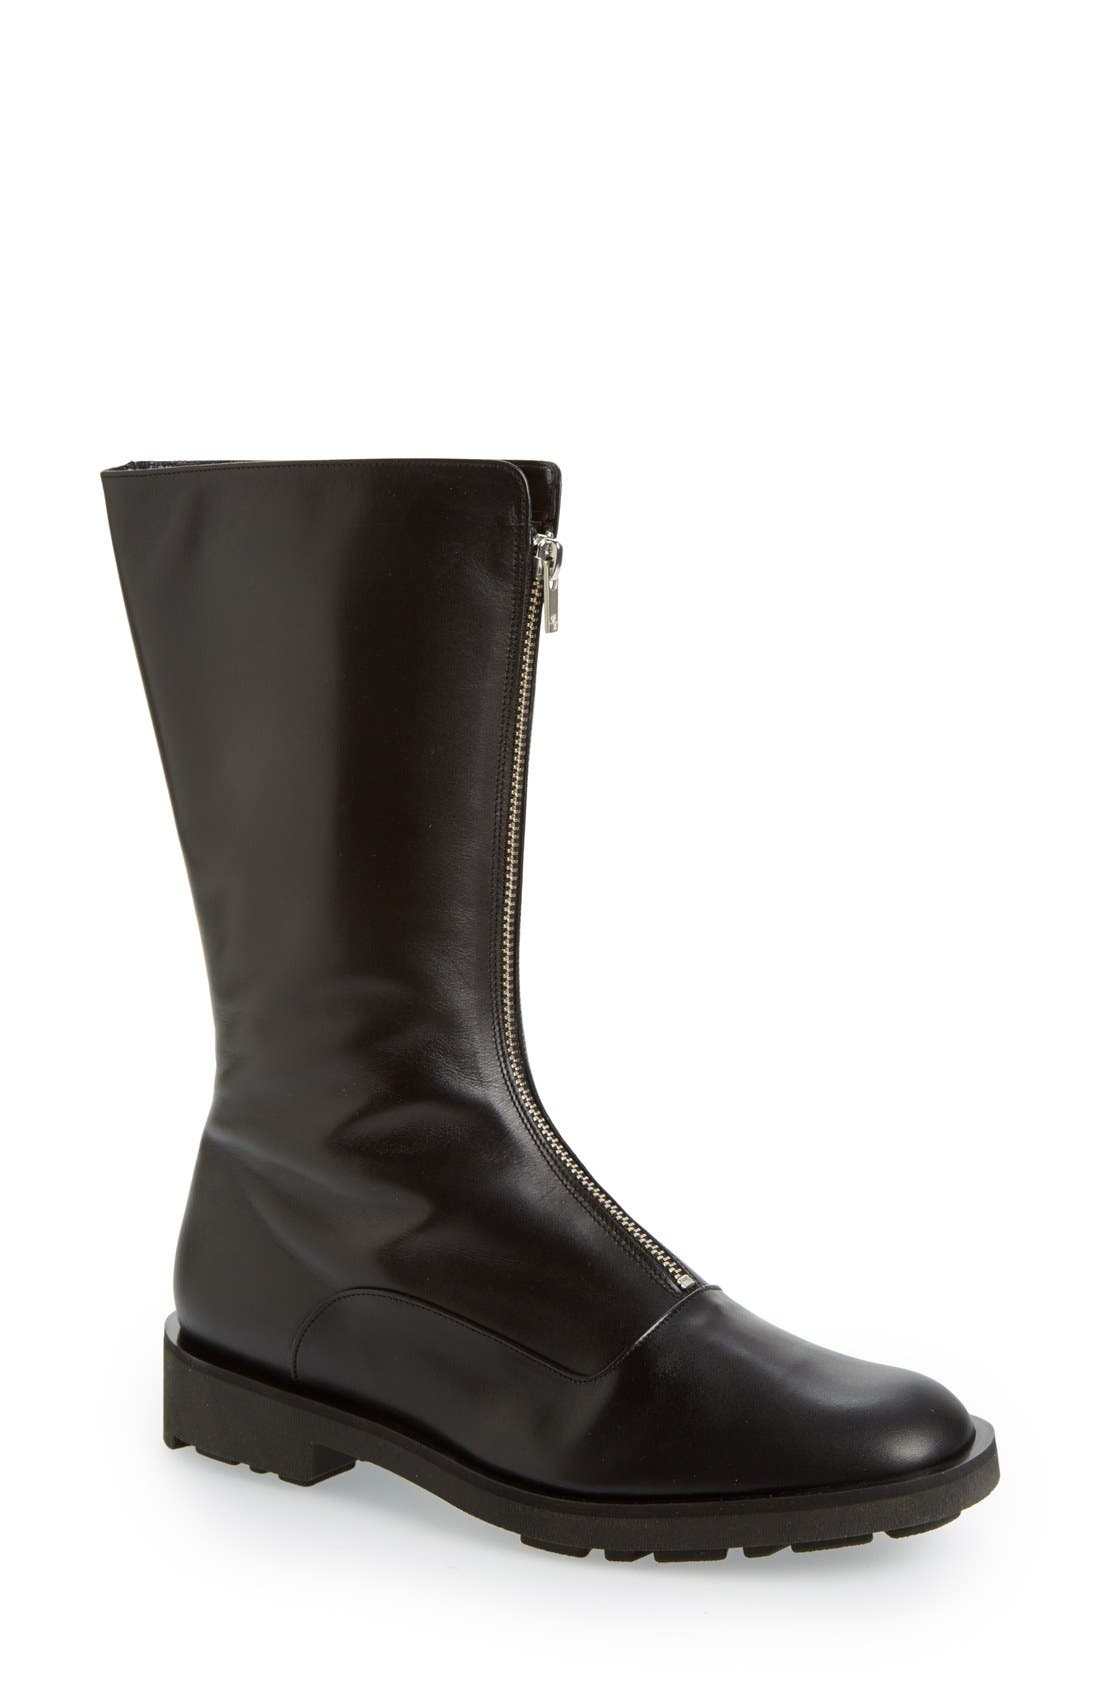 Alternate Image 1 Selected - Robert Clergerie 'Estim' Boot (Women)